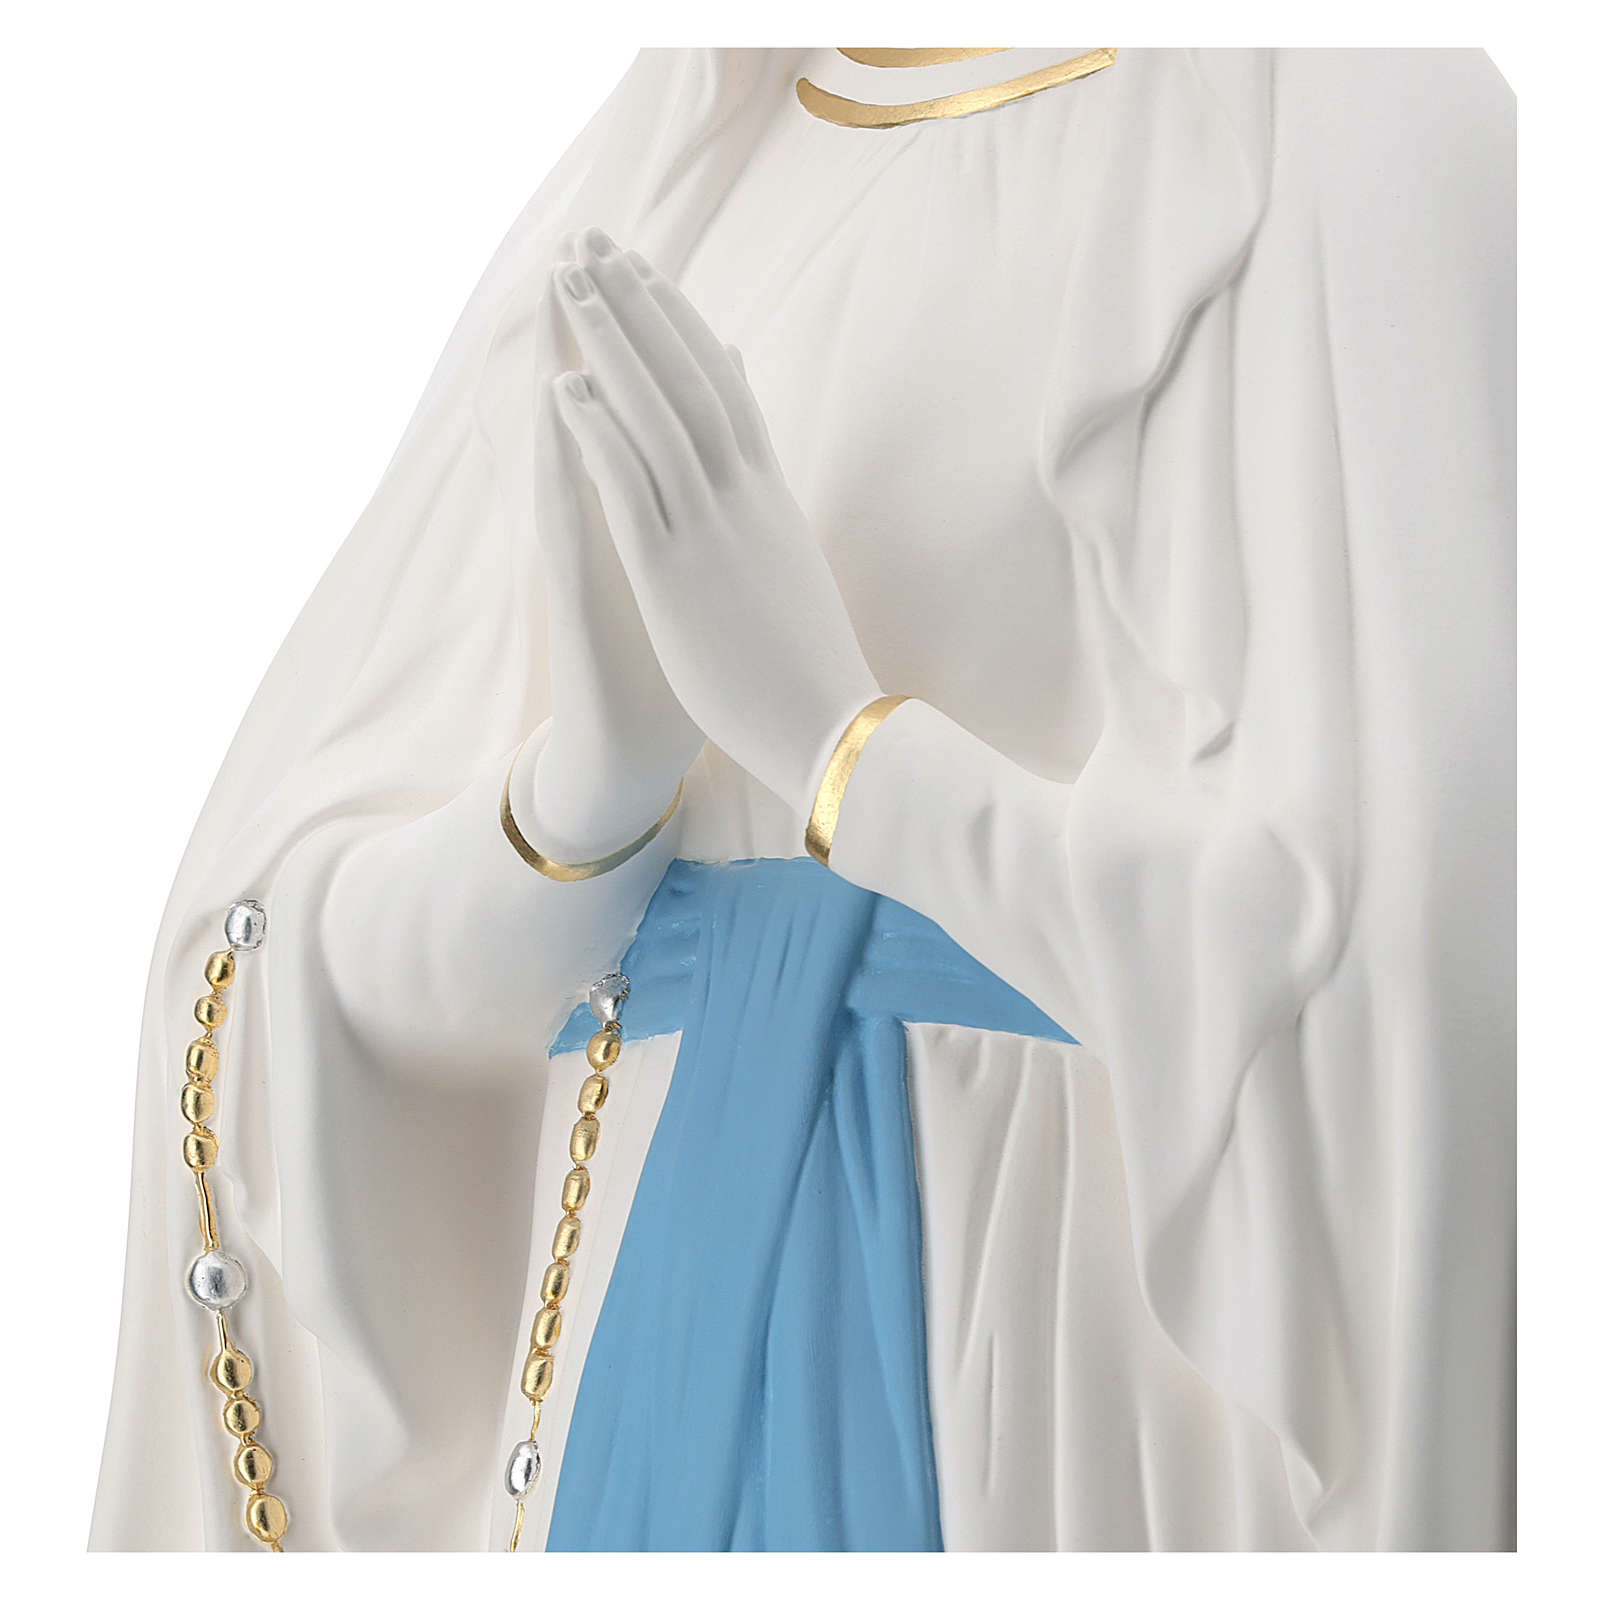 Statua Madonna di Lourdes vetroresina 130 cm bianca PER ESTERNO 4